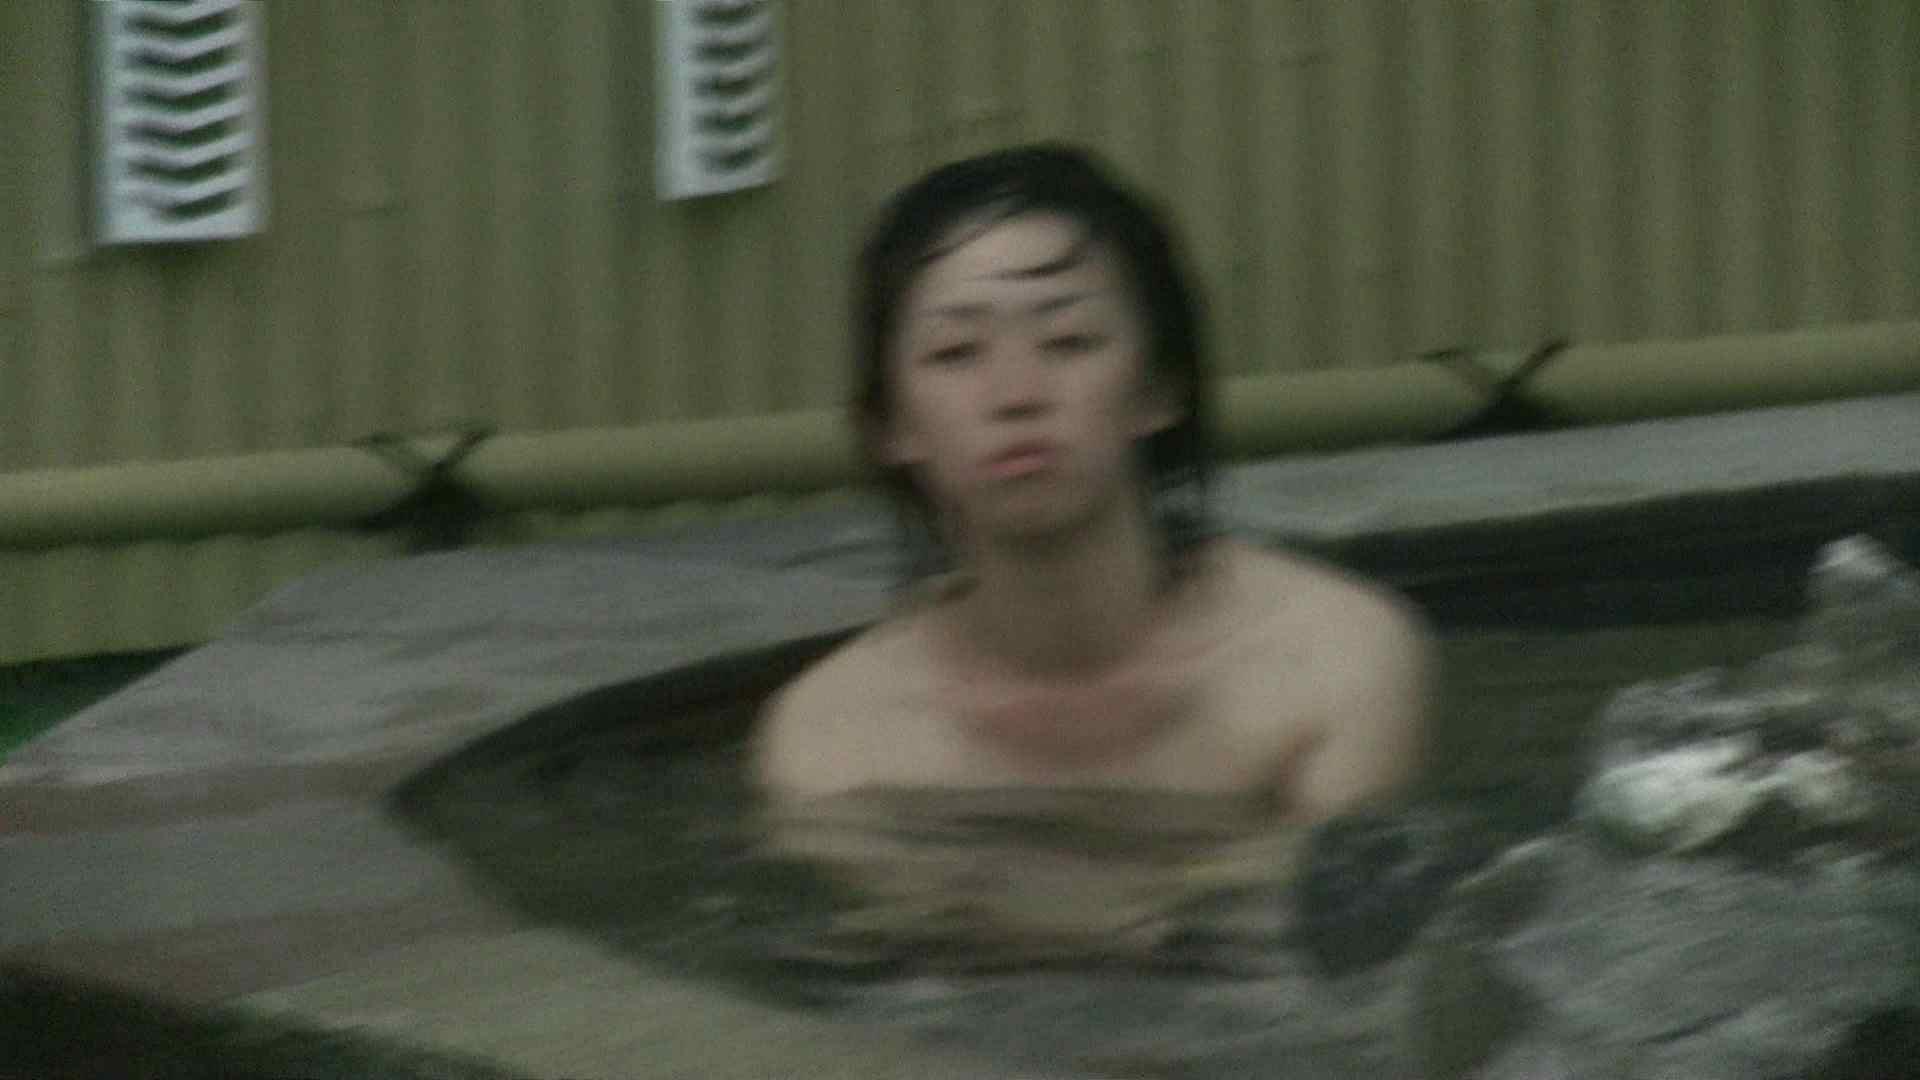 Aquaな露天風呂Vol.170 盗撮   OLセックス  54画像 16